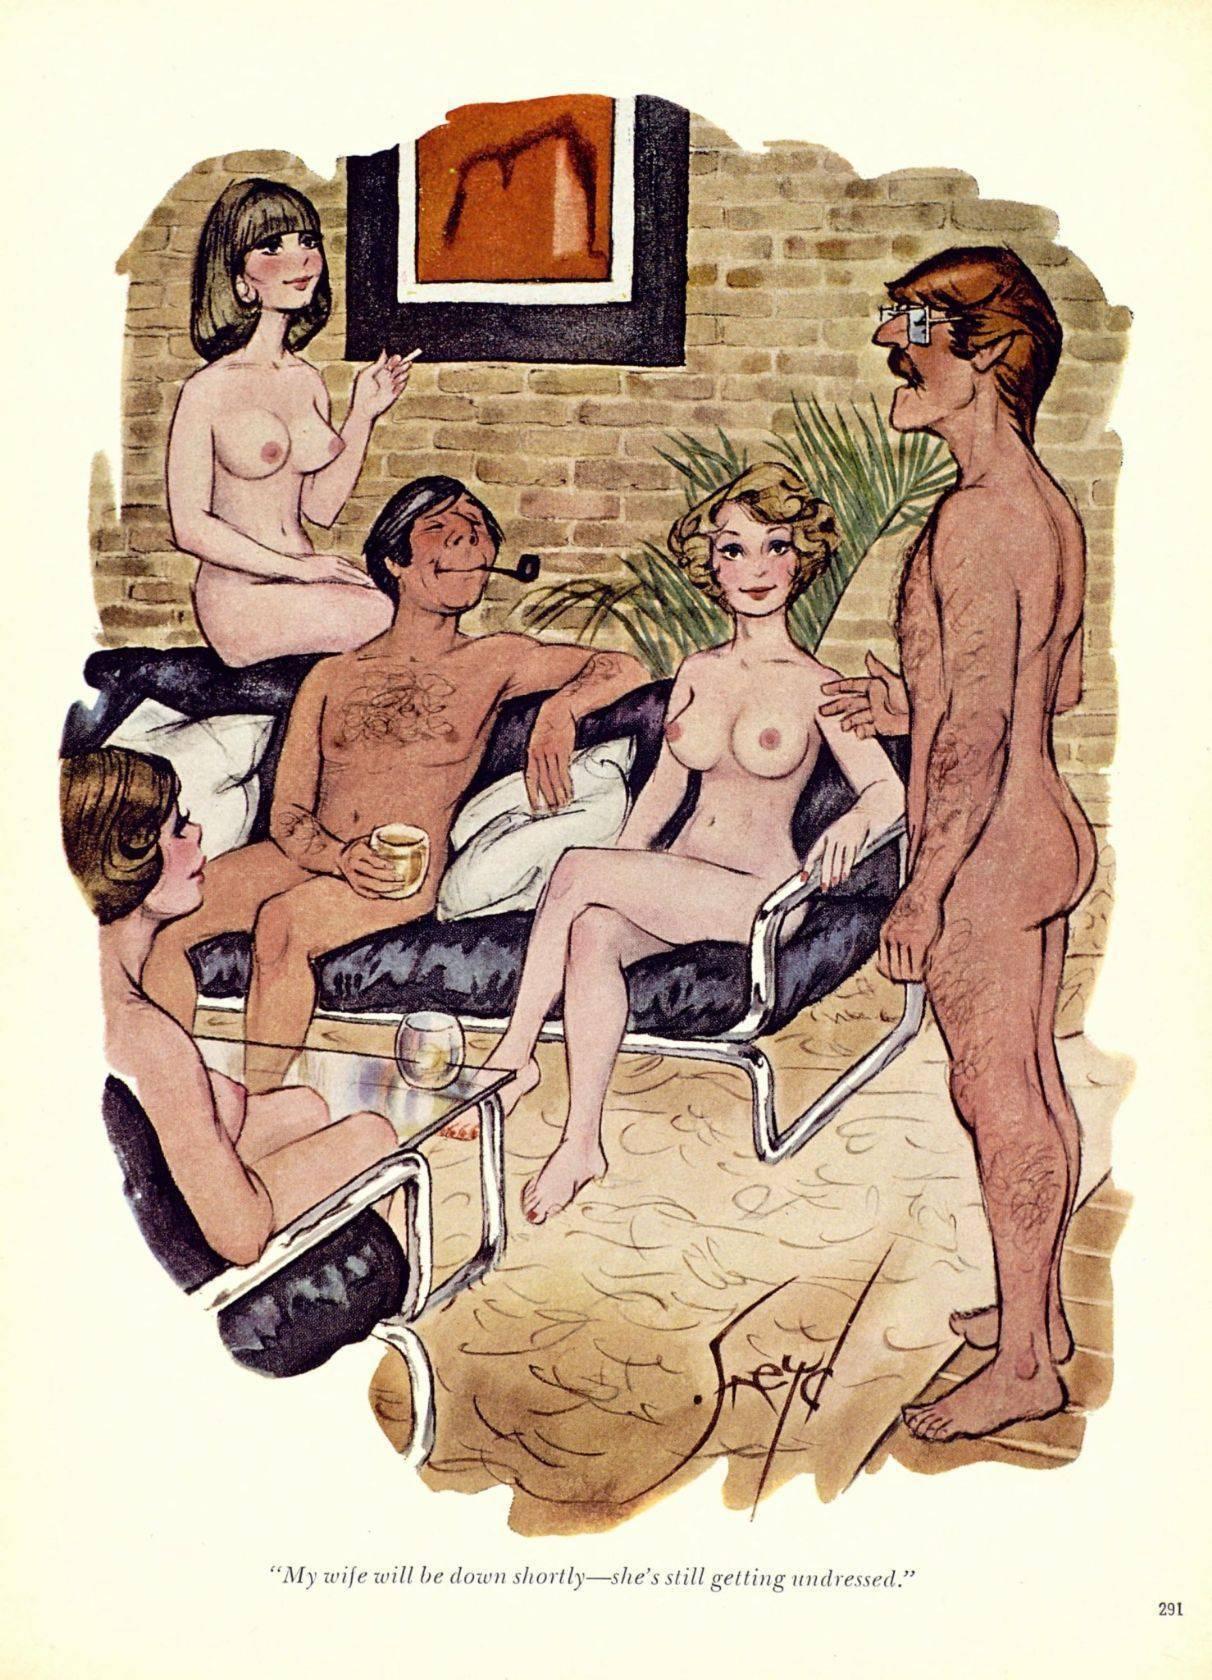 staraya-eroticheskaya-karikatura-kartinki